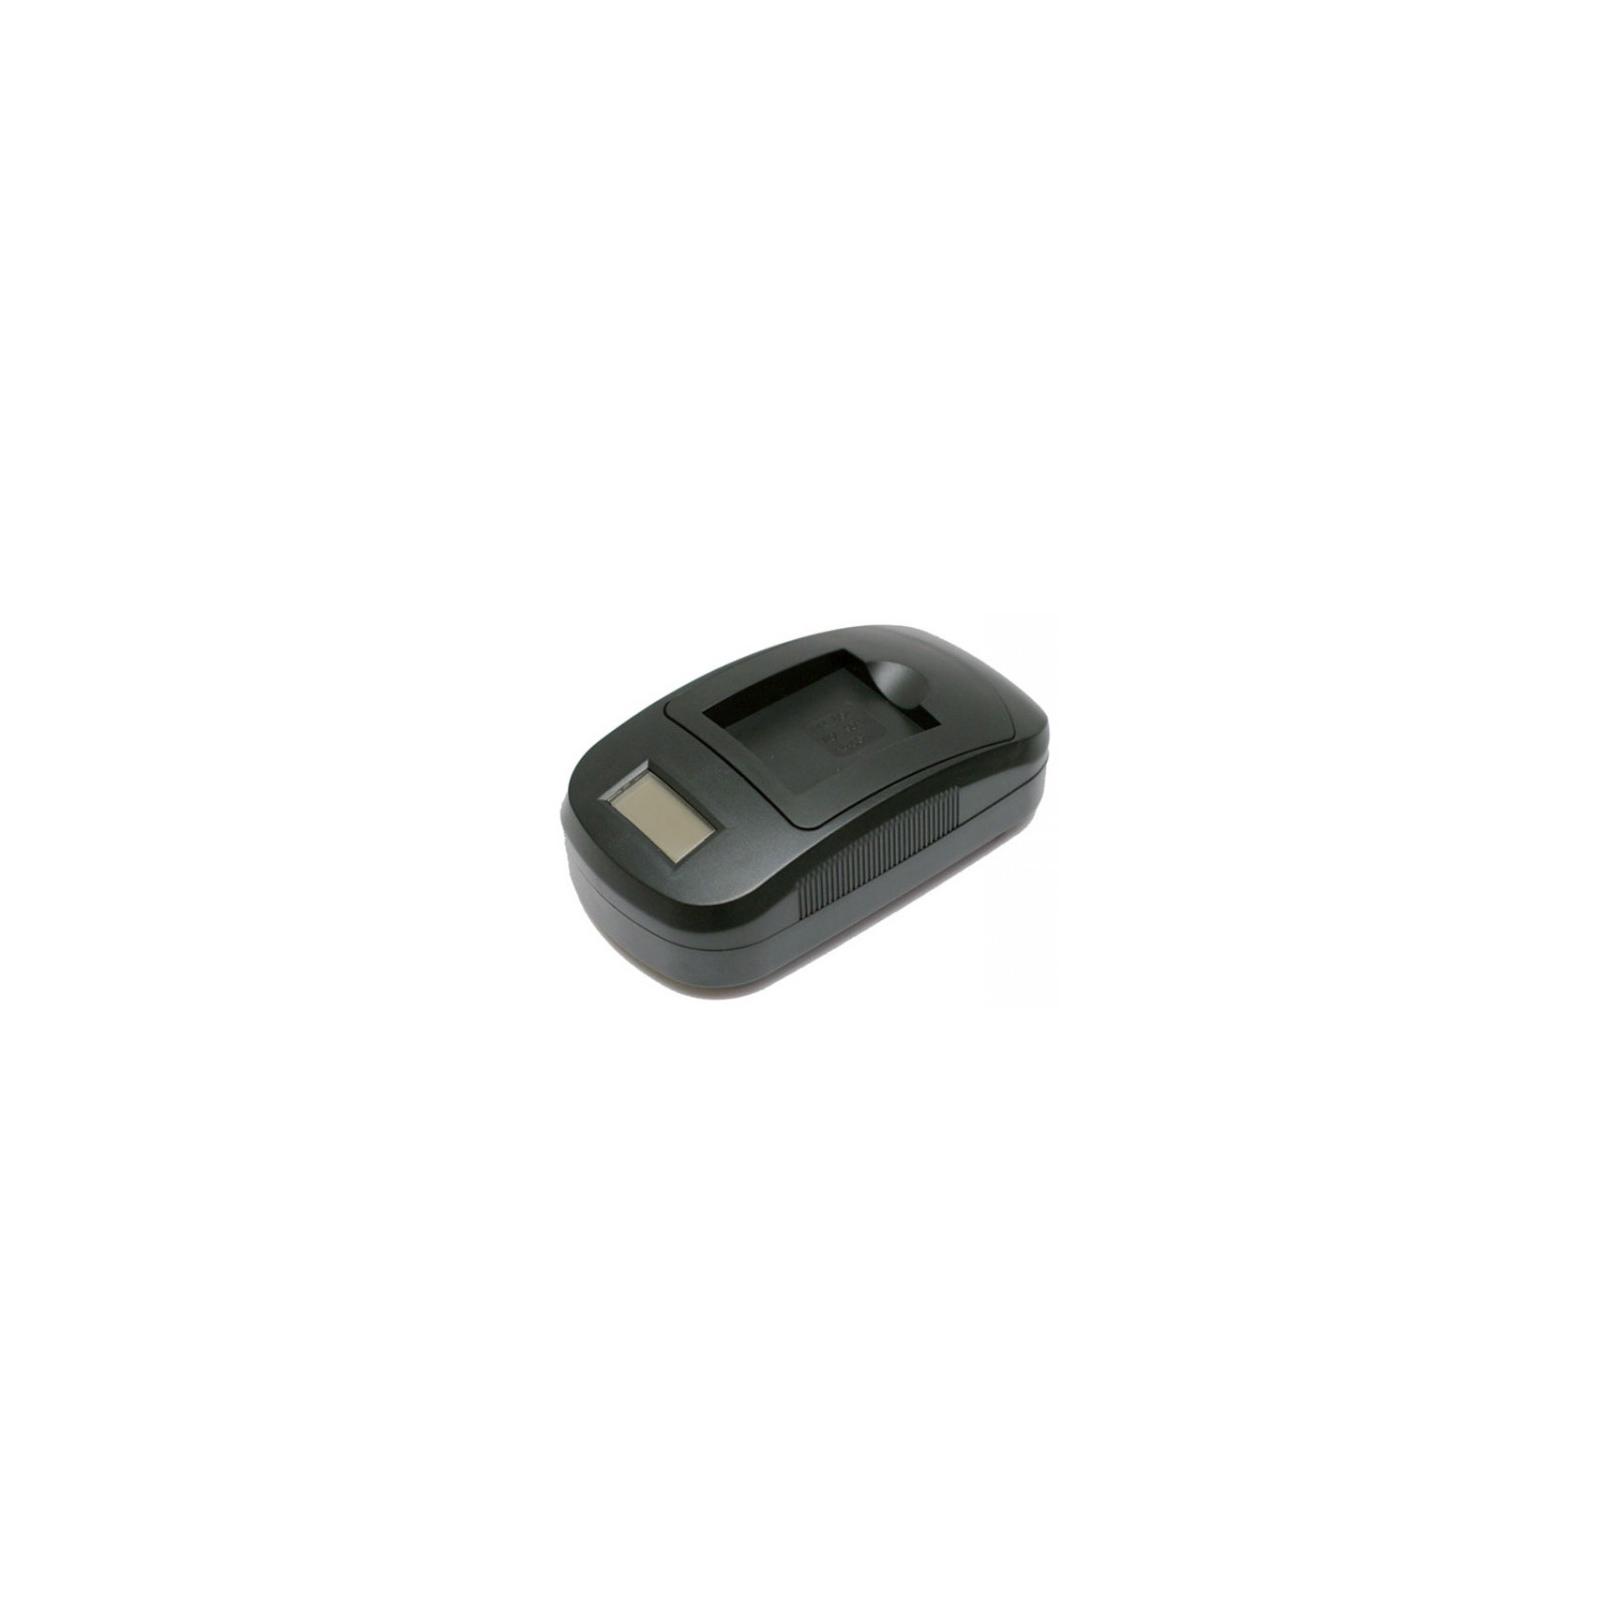 Зарядное устройство для фото EXTRADIGITAL Canon NB-4L, NB-8L, Samsung BP125A (LCD) (DV0LCD2005) изображение 3